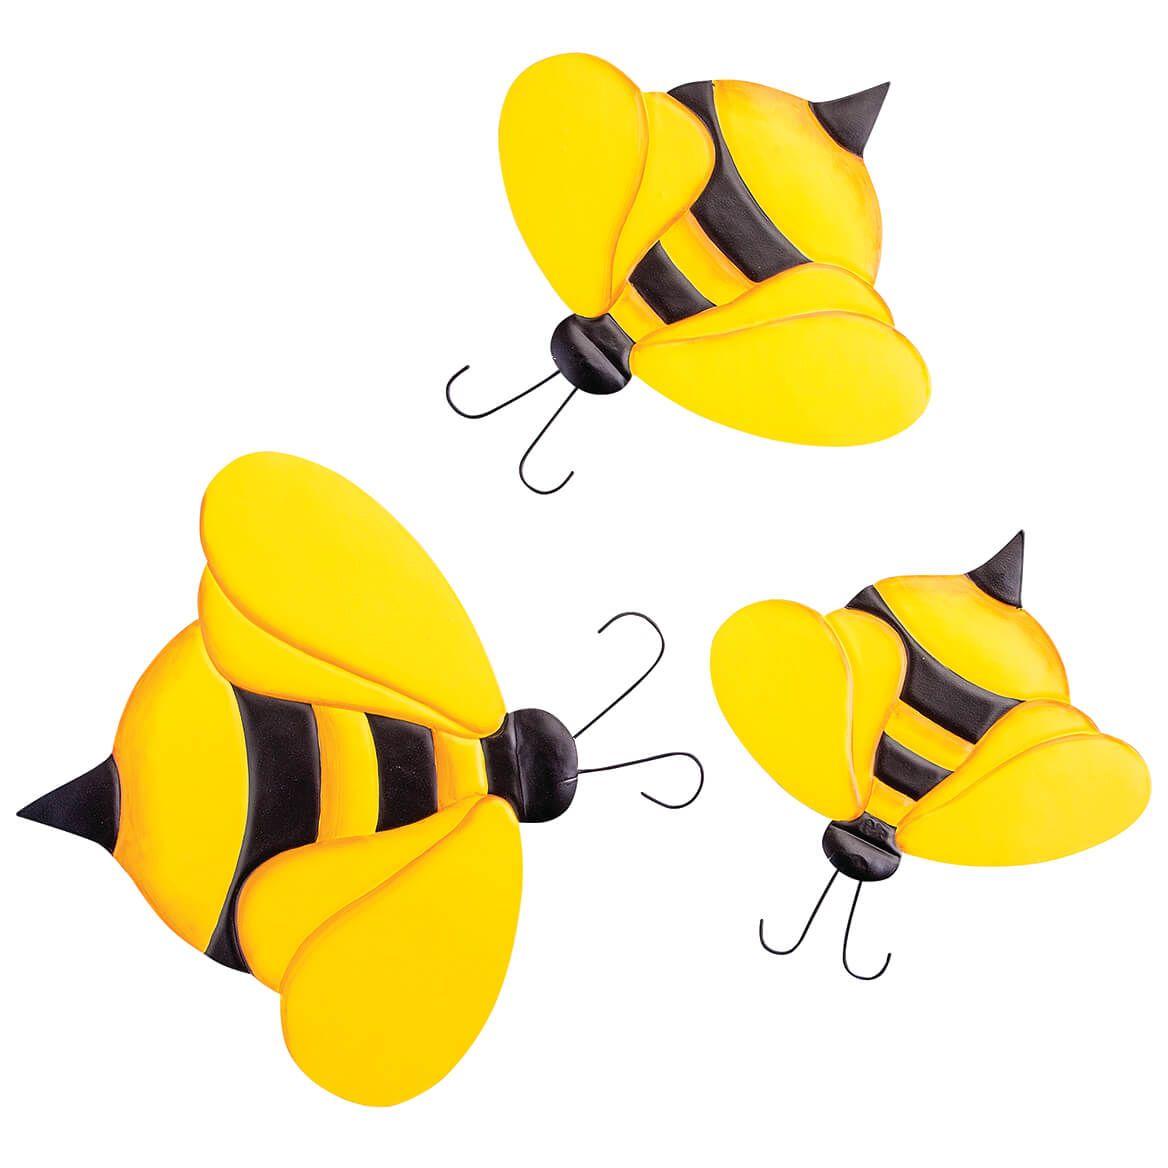 Metal Bumblebee Hangers, Set of 3 by Fox River™ Creations-369032